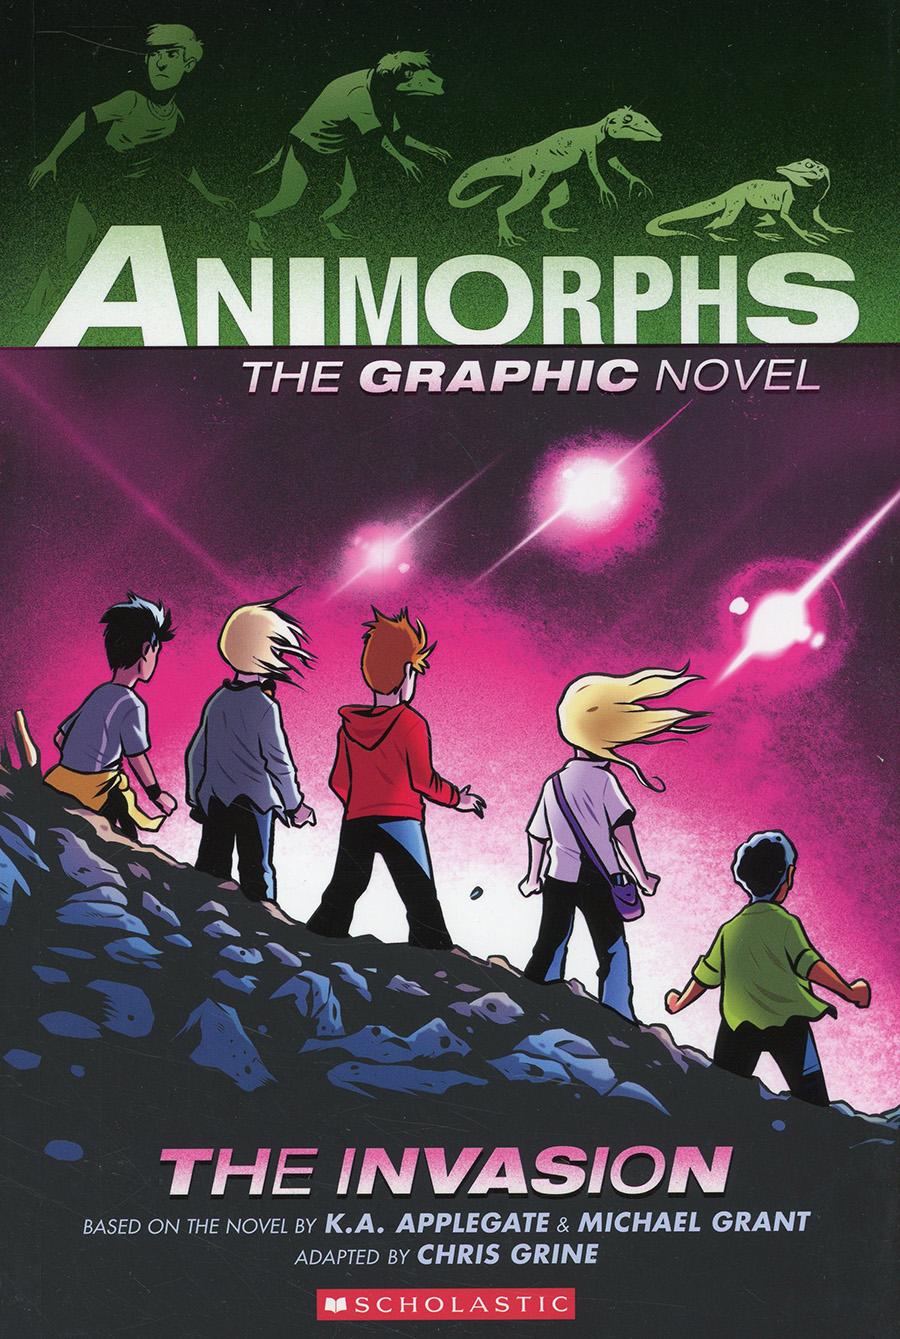 Animorphs The Graphic Novel Vol 1 The Invasion TP